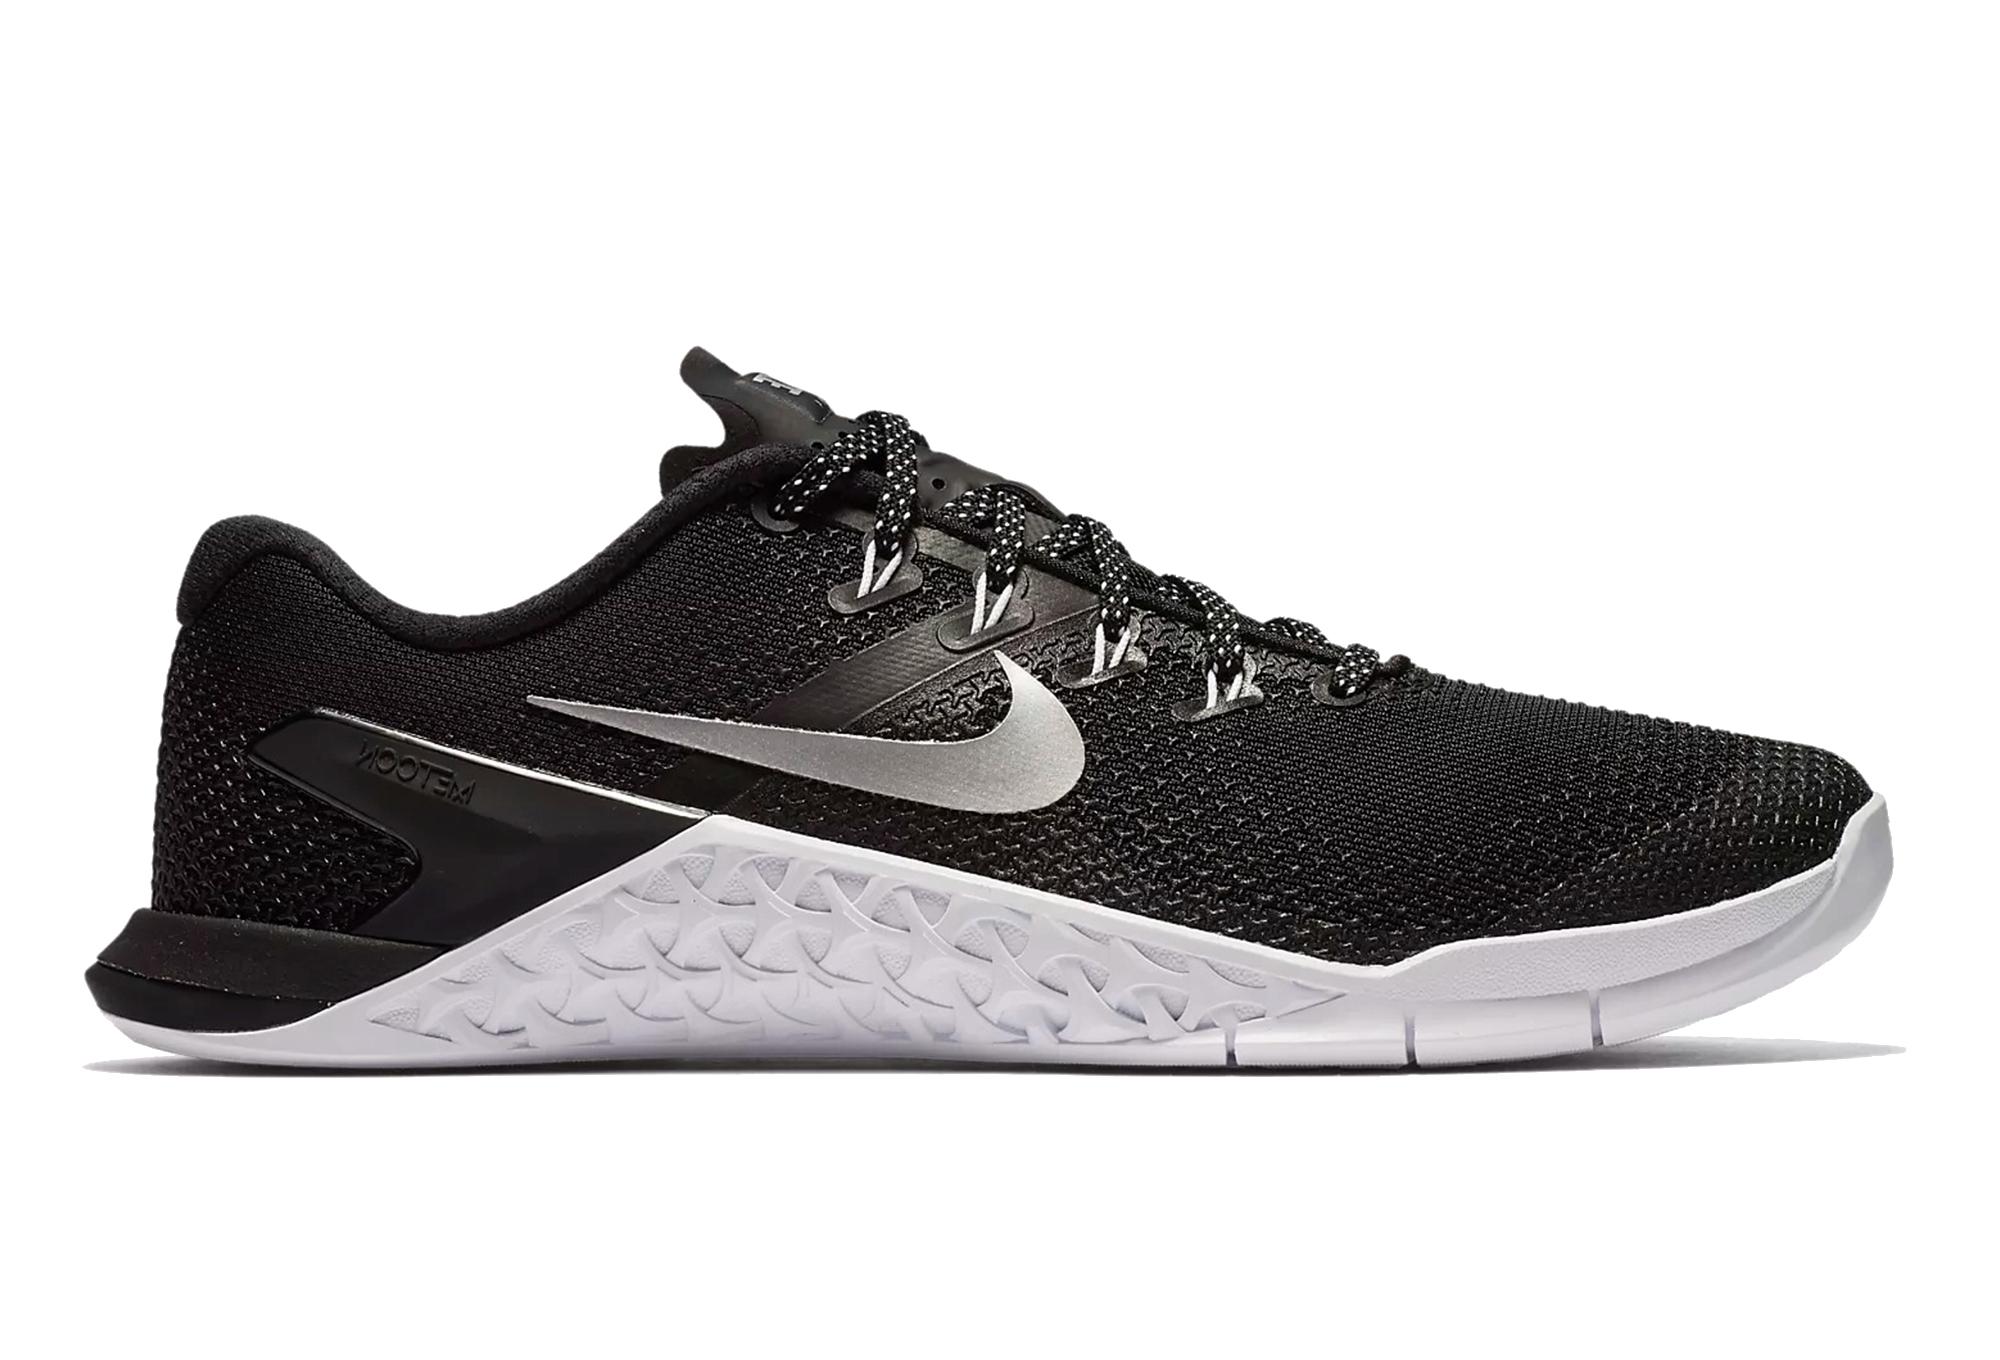 newest cac6b cce66 Chaussures de Cross Training Femme Nike Metcon 4 Noir   Blanc